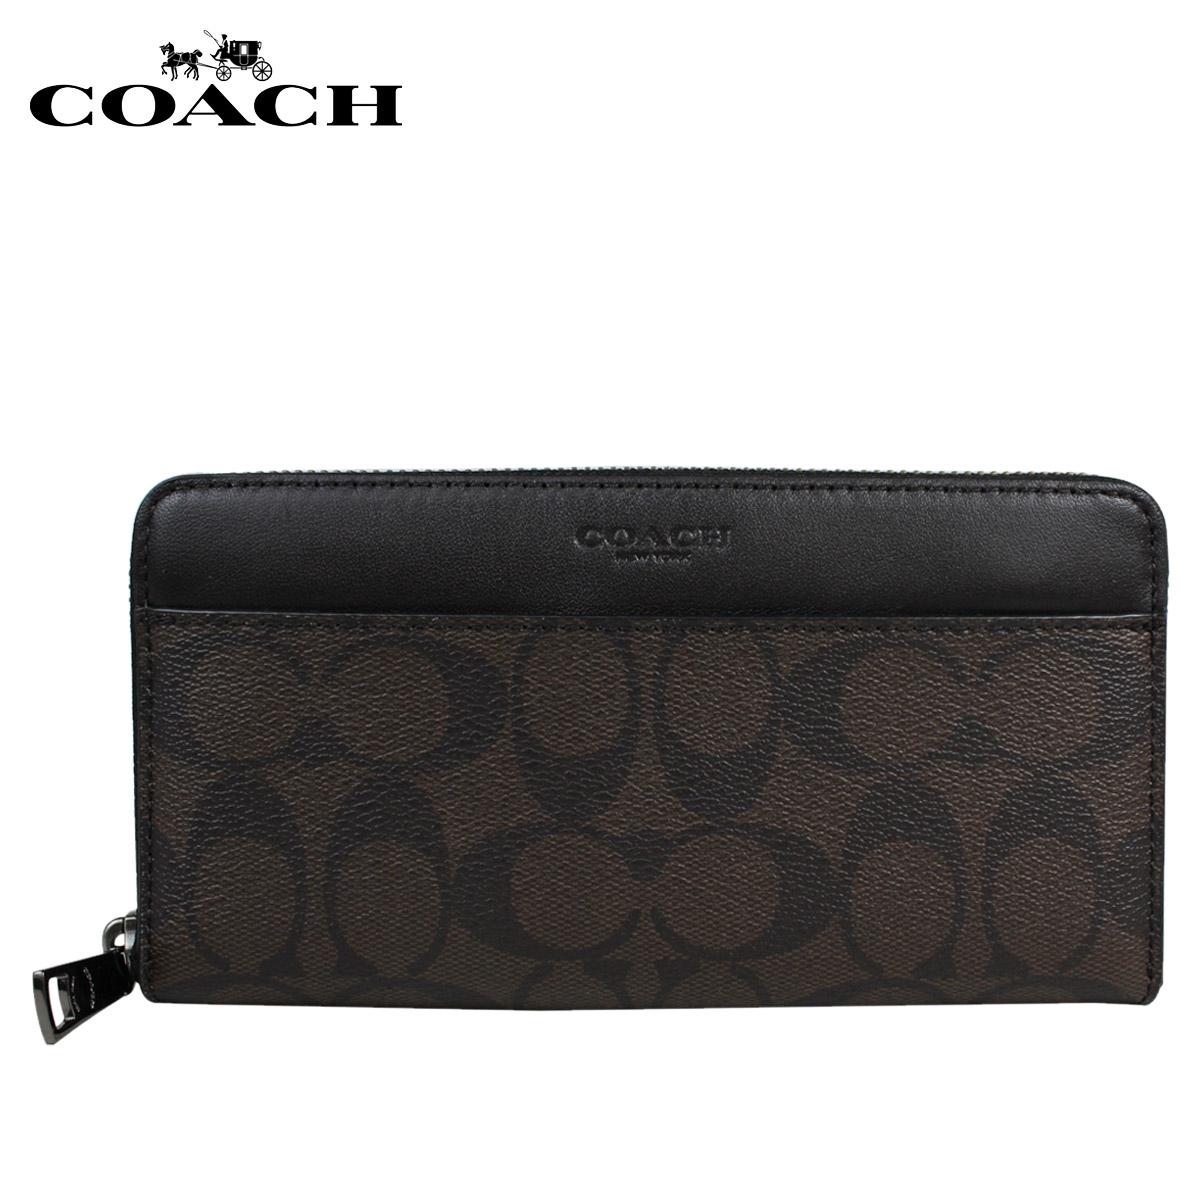 Coach online shopping